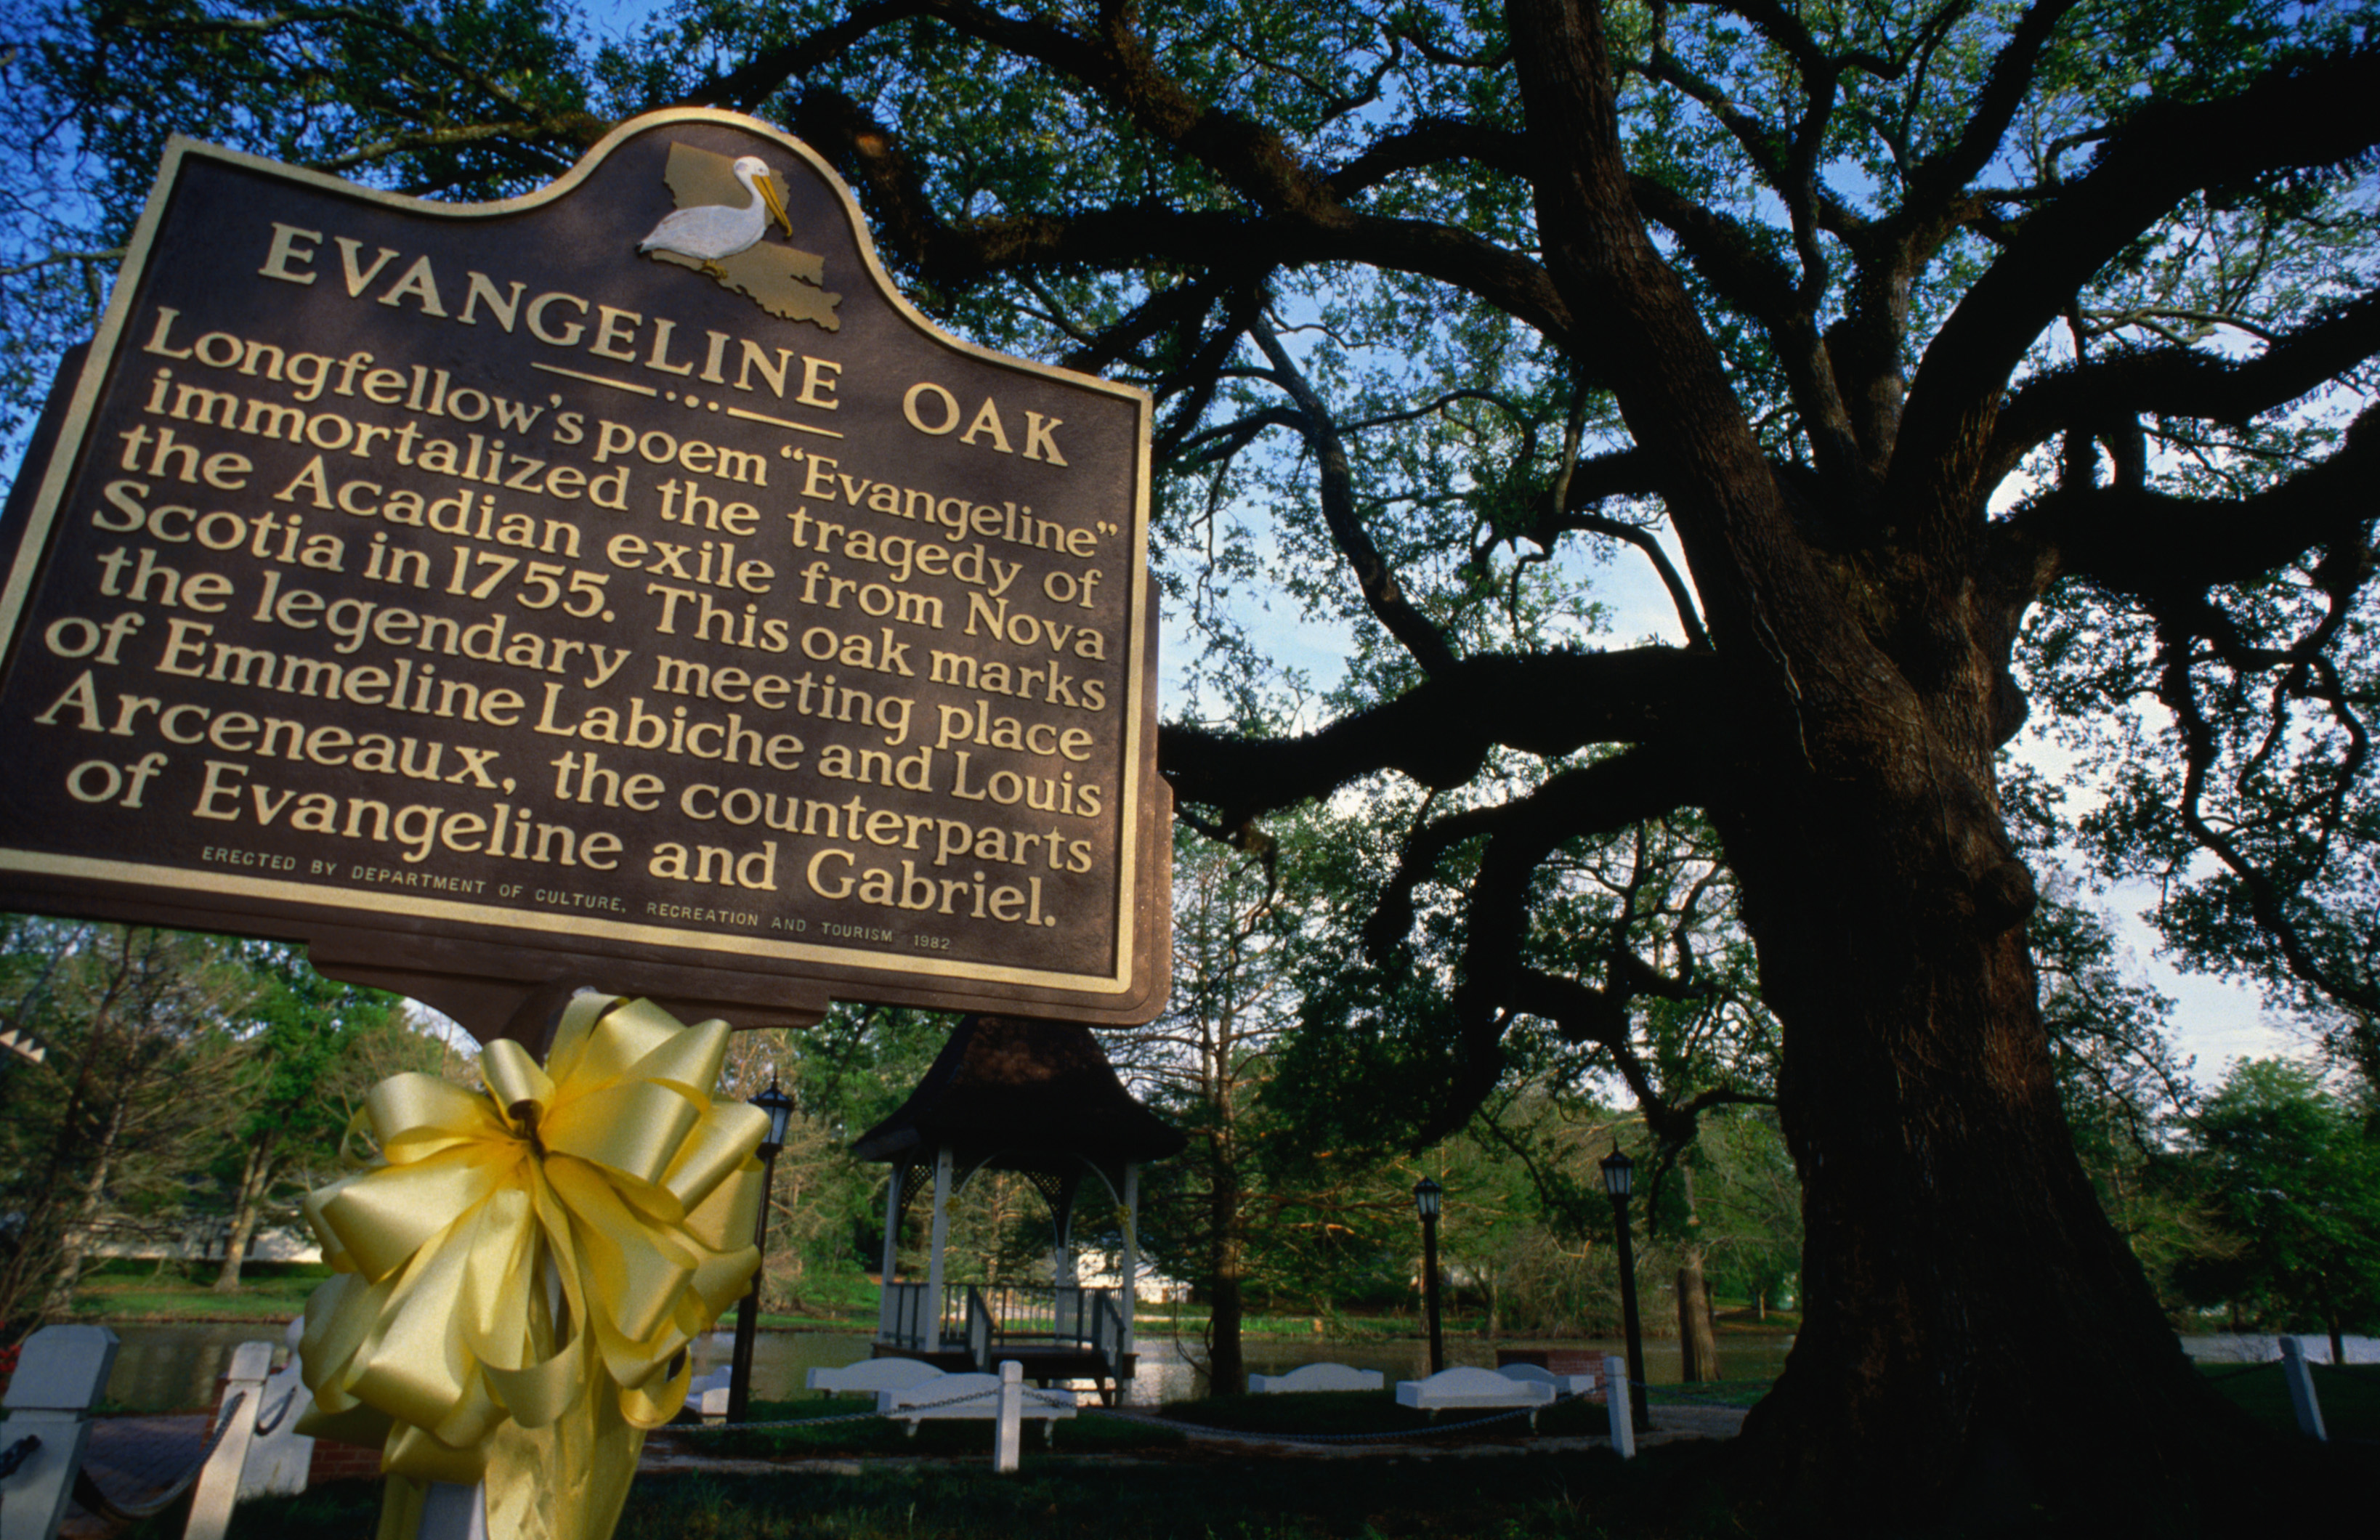 Sign commemorating Evangeline Oak from Henry Longfellow's poem